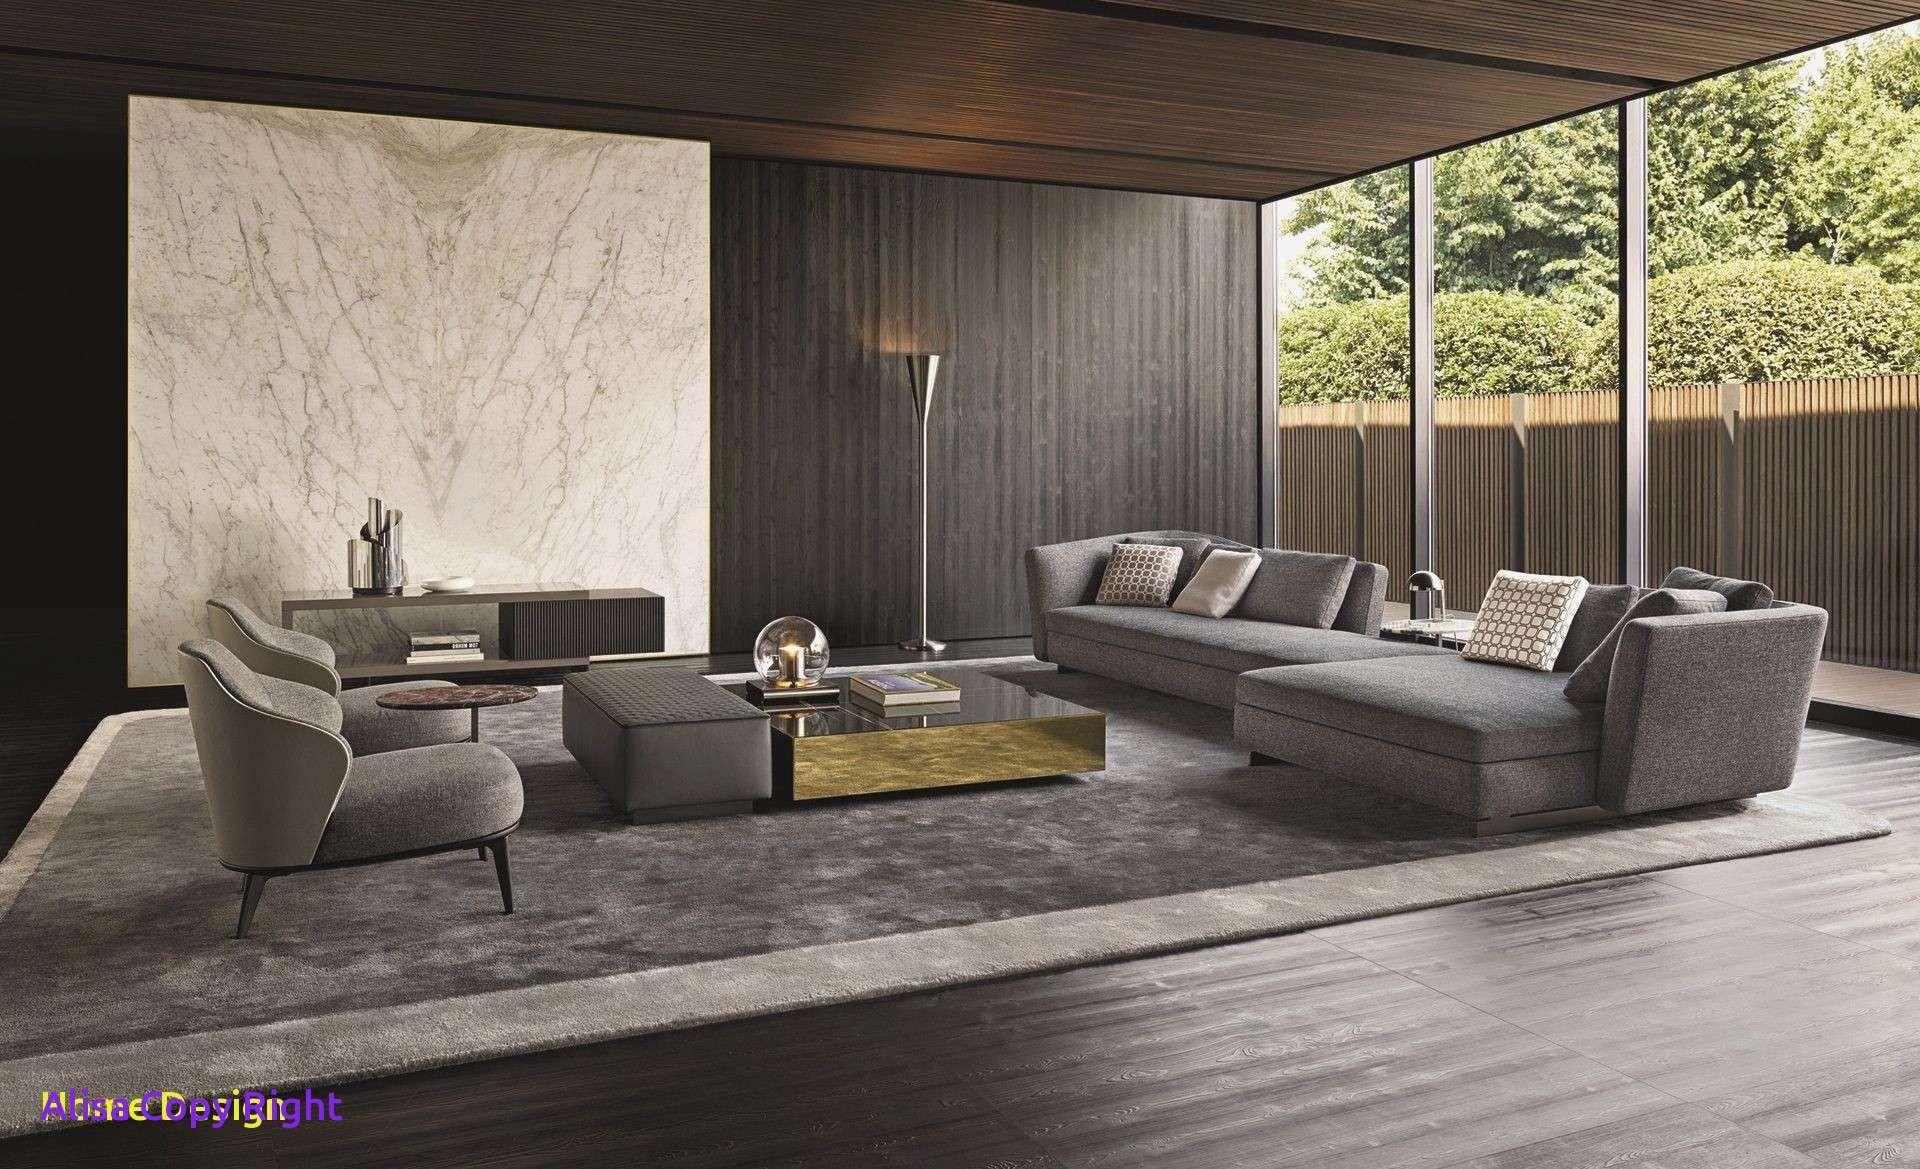 Pin By Home Design Diy On Alisa Home Diy Luxury Italian Furniture Italian Bedroom Furniture Italian Furniture Brands